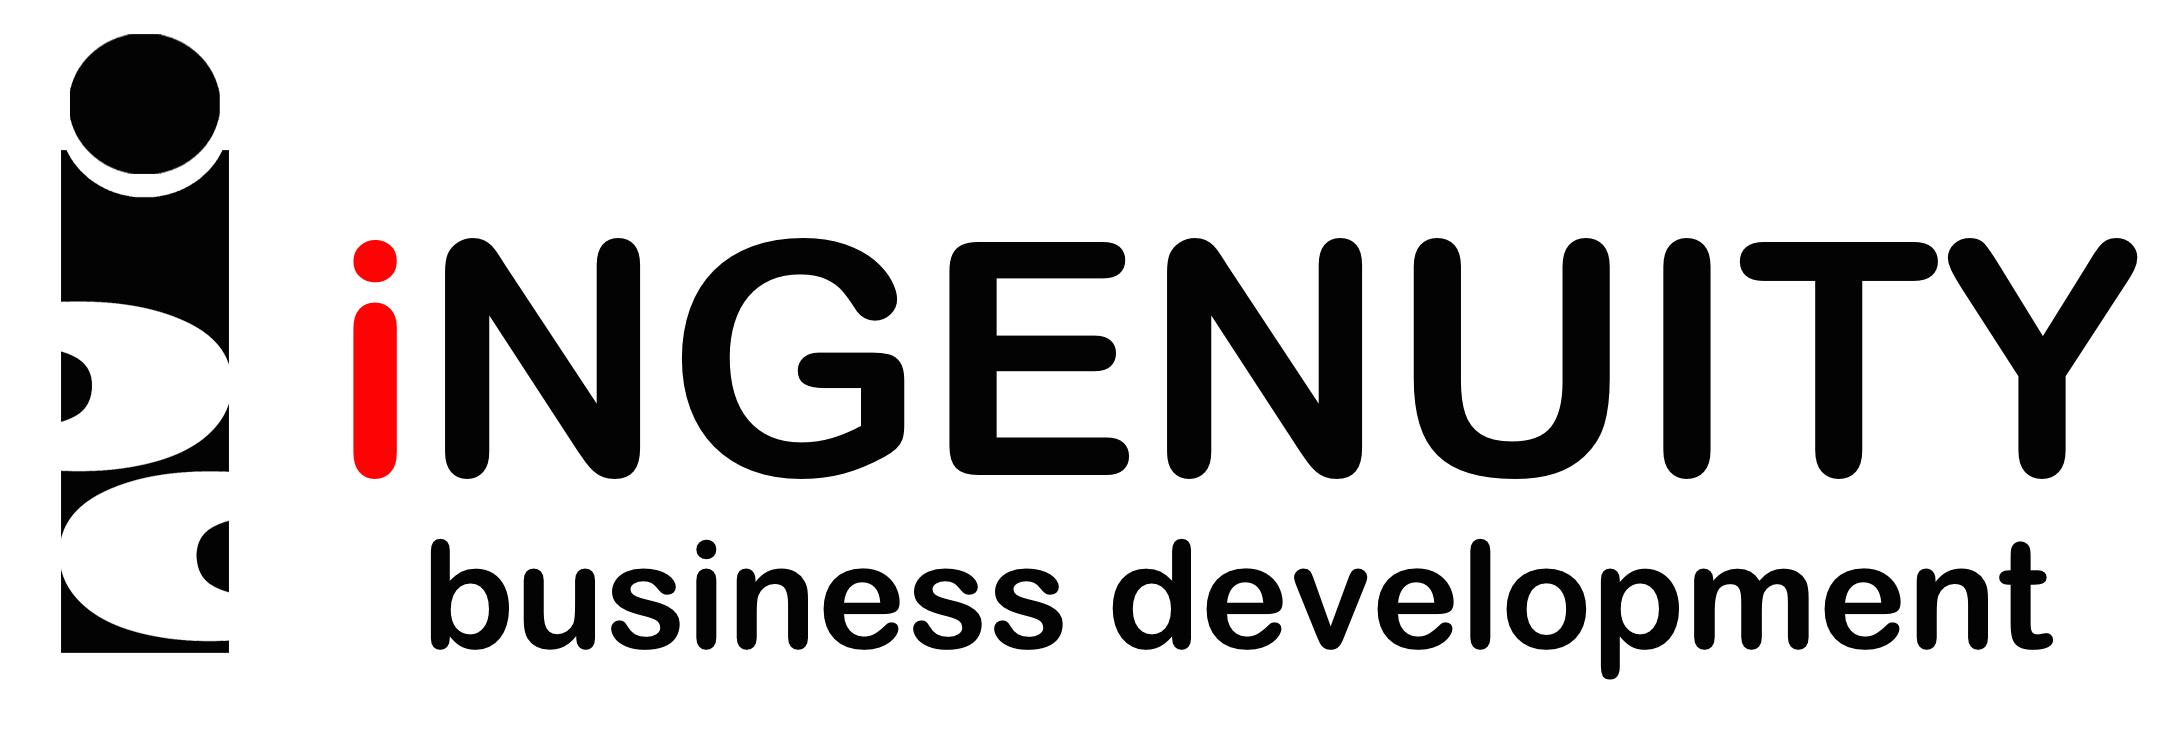 Ingenuity Business Development